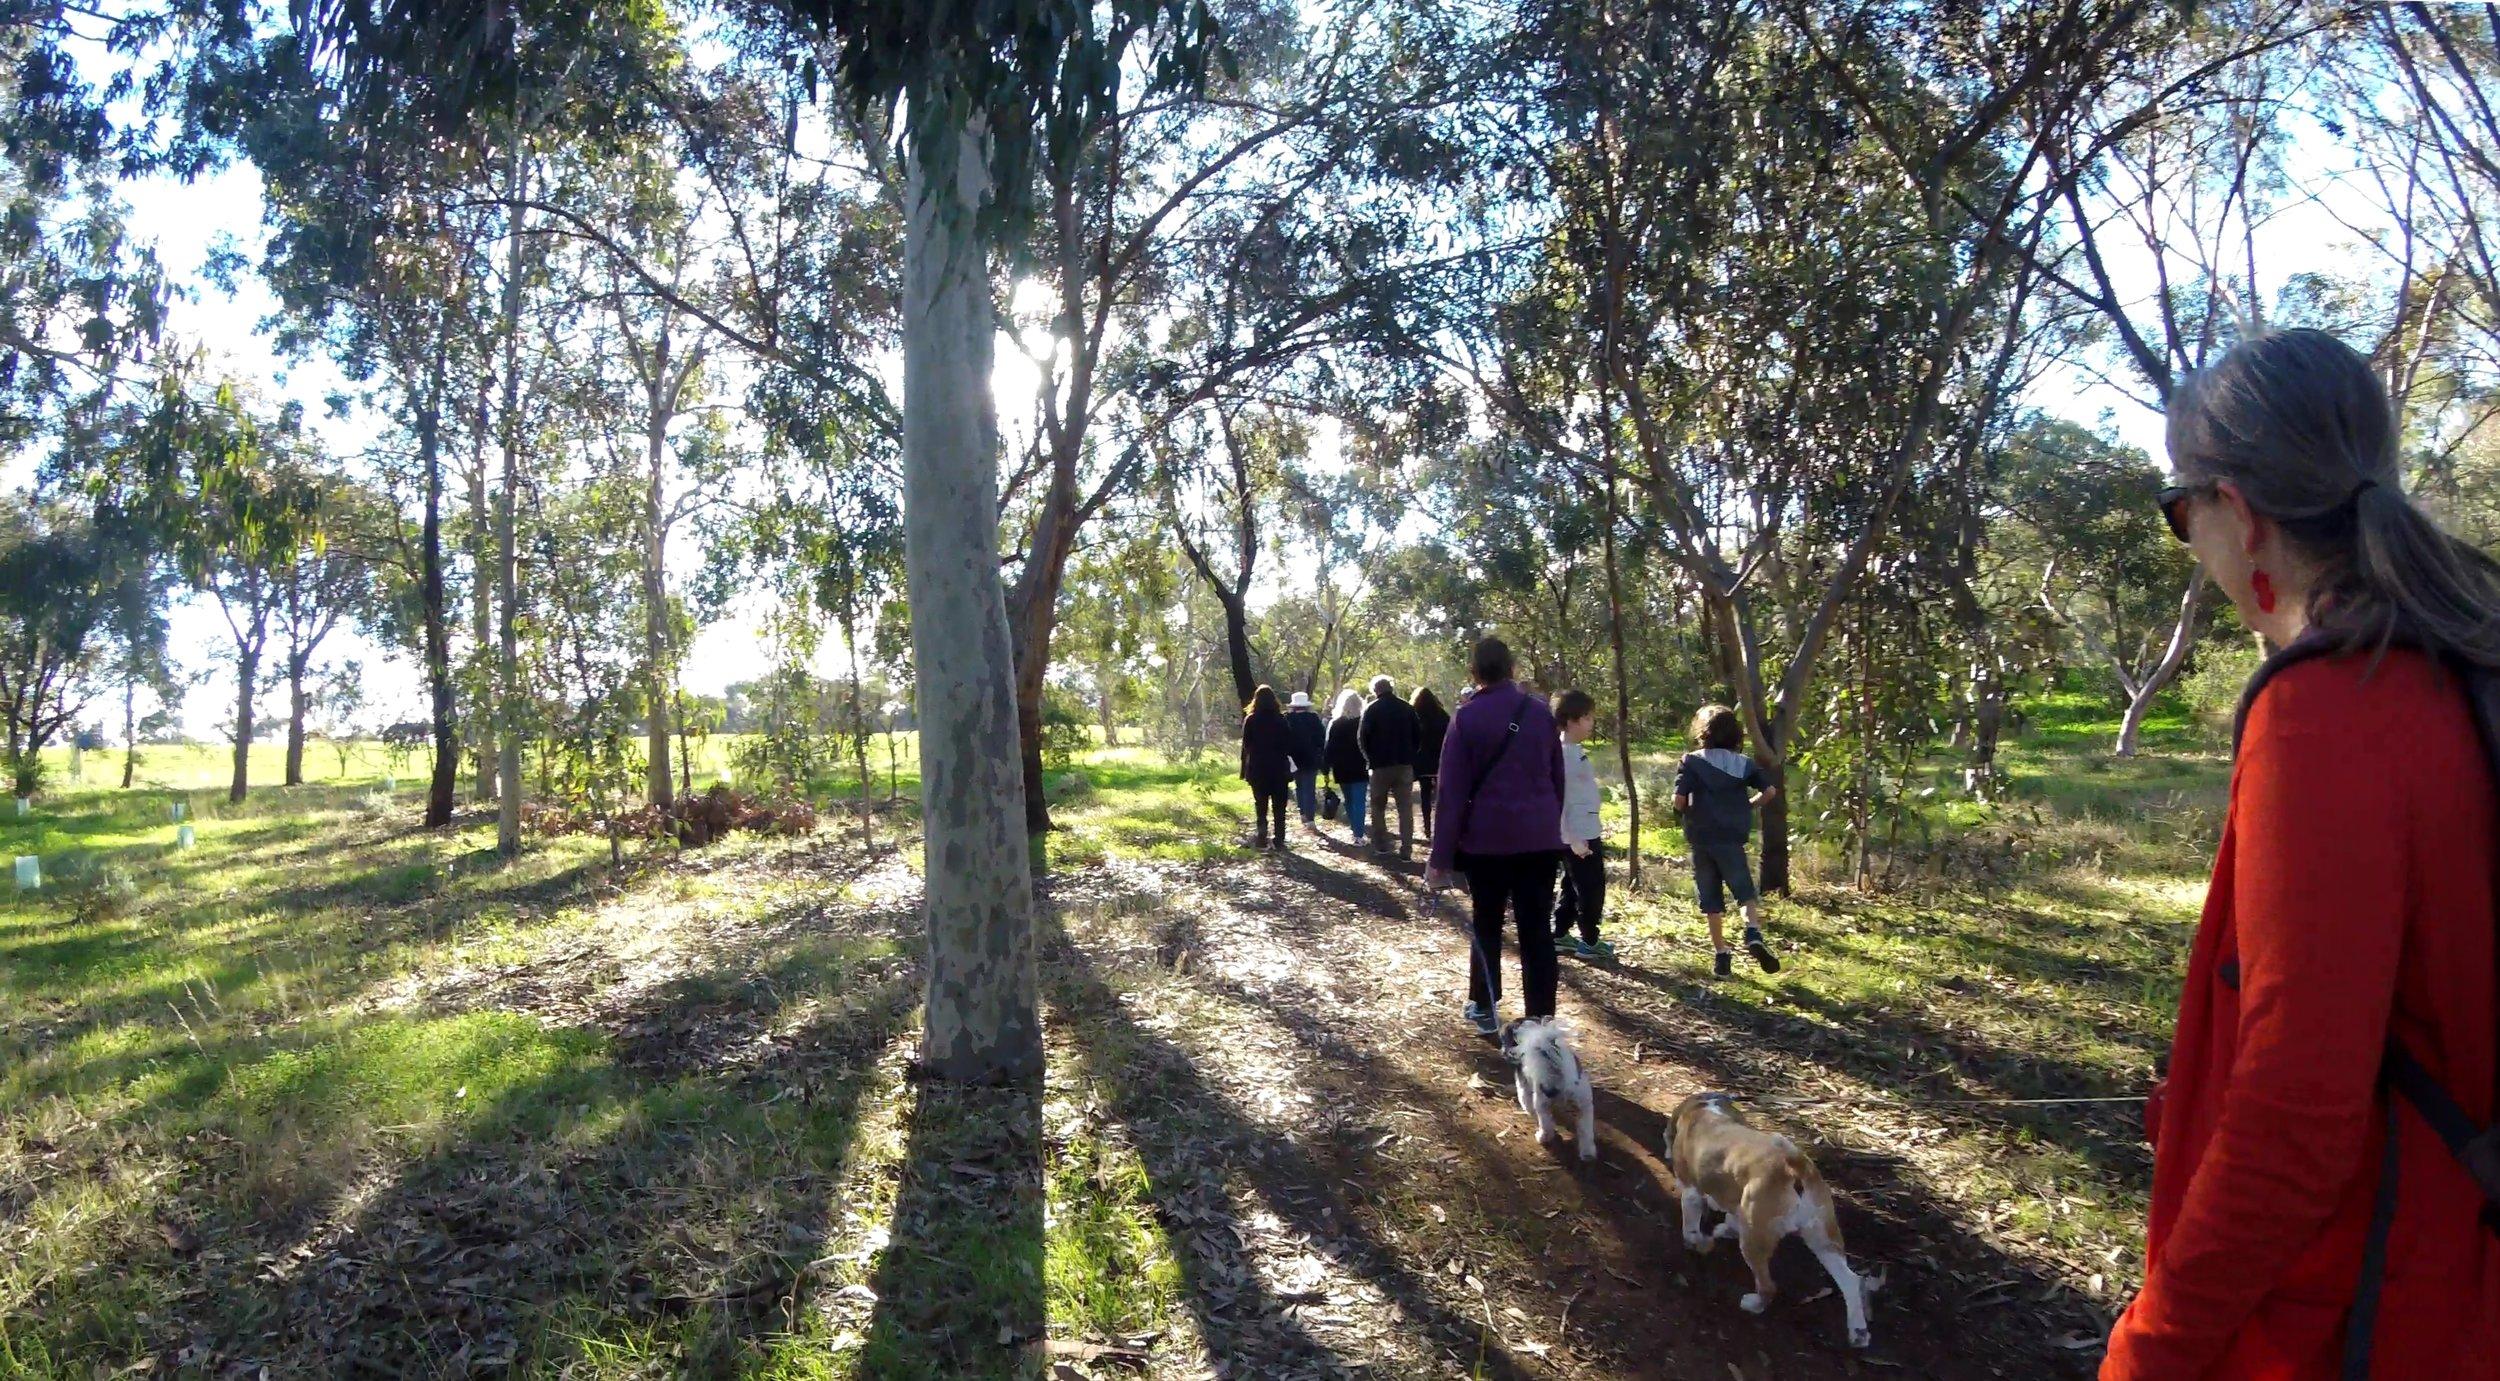 Walking through Lefevre Park / Nantu Wama (Park 6)